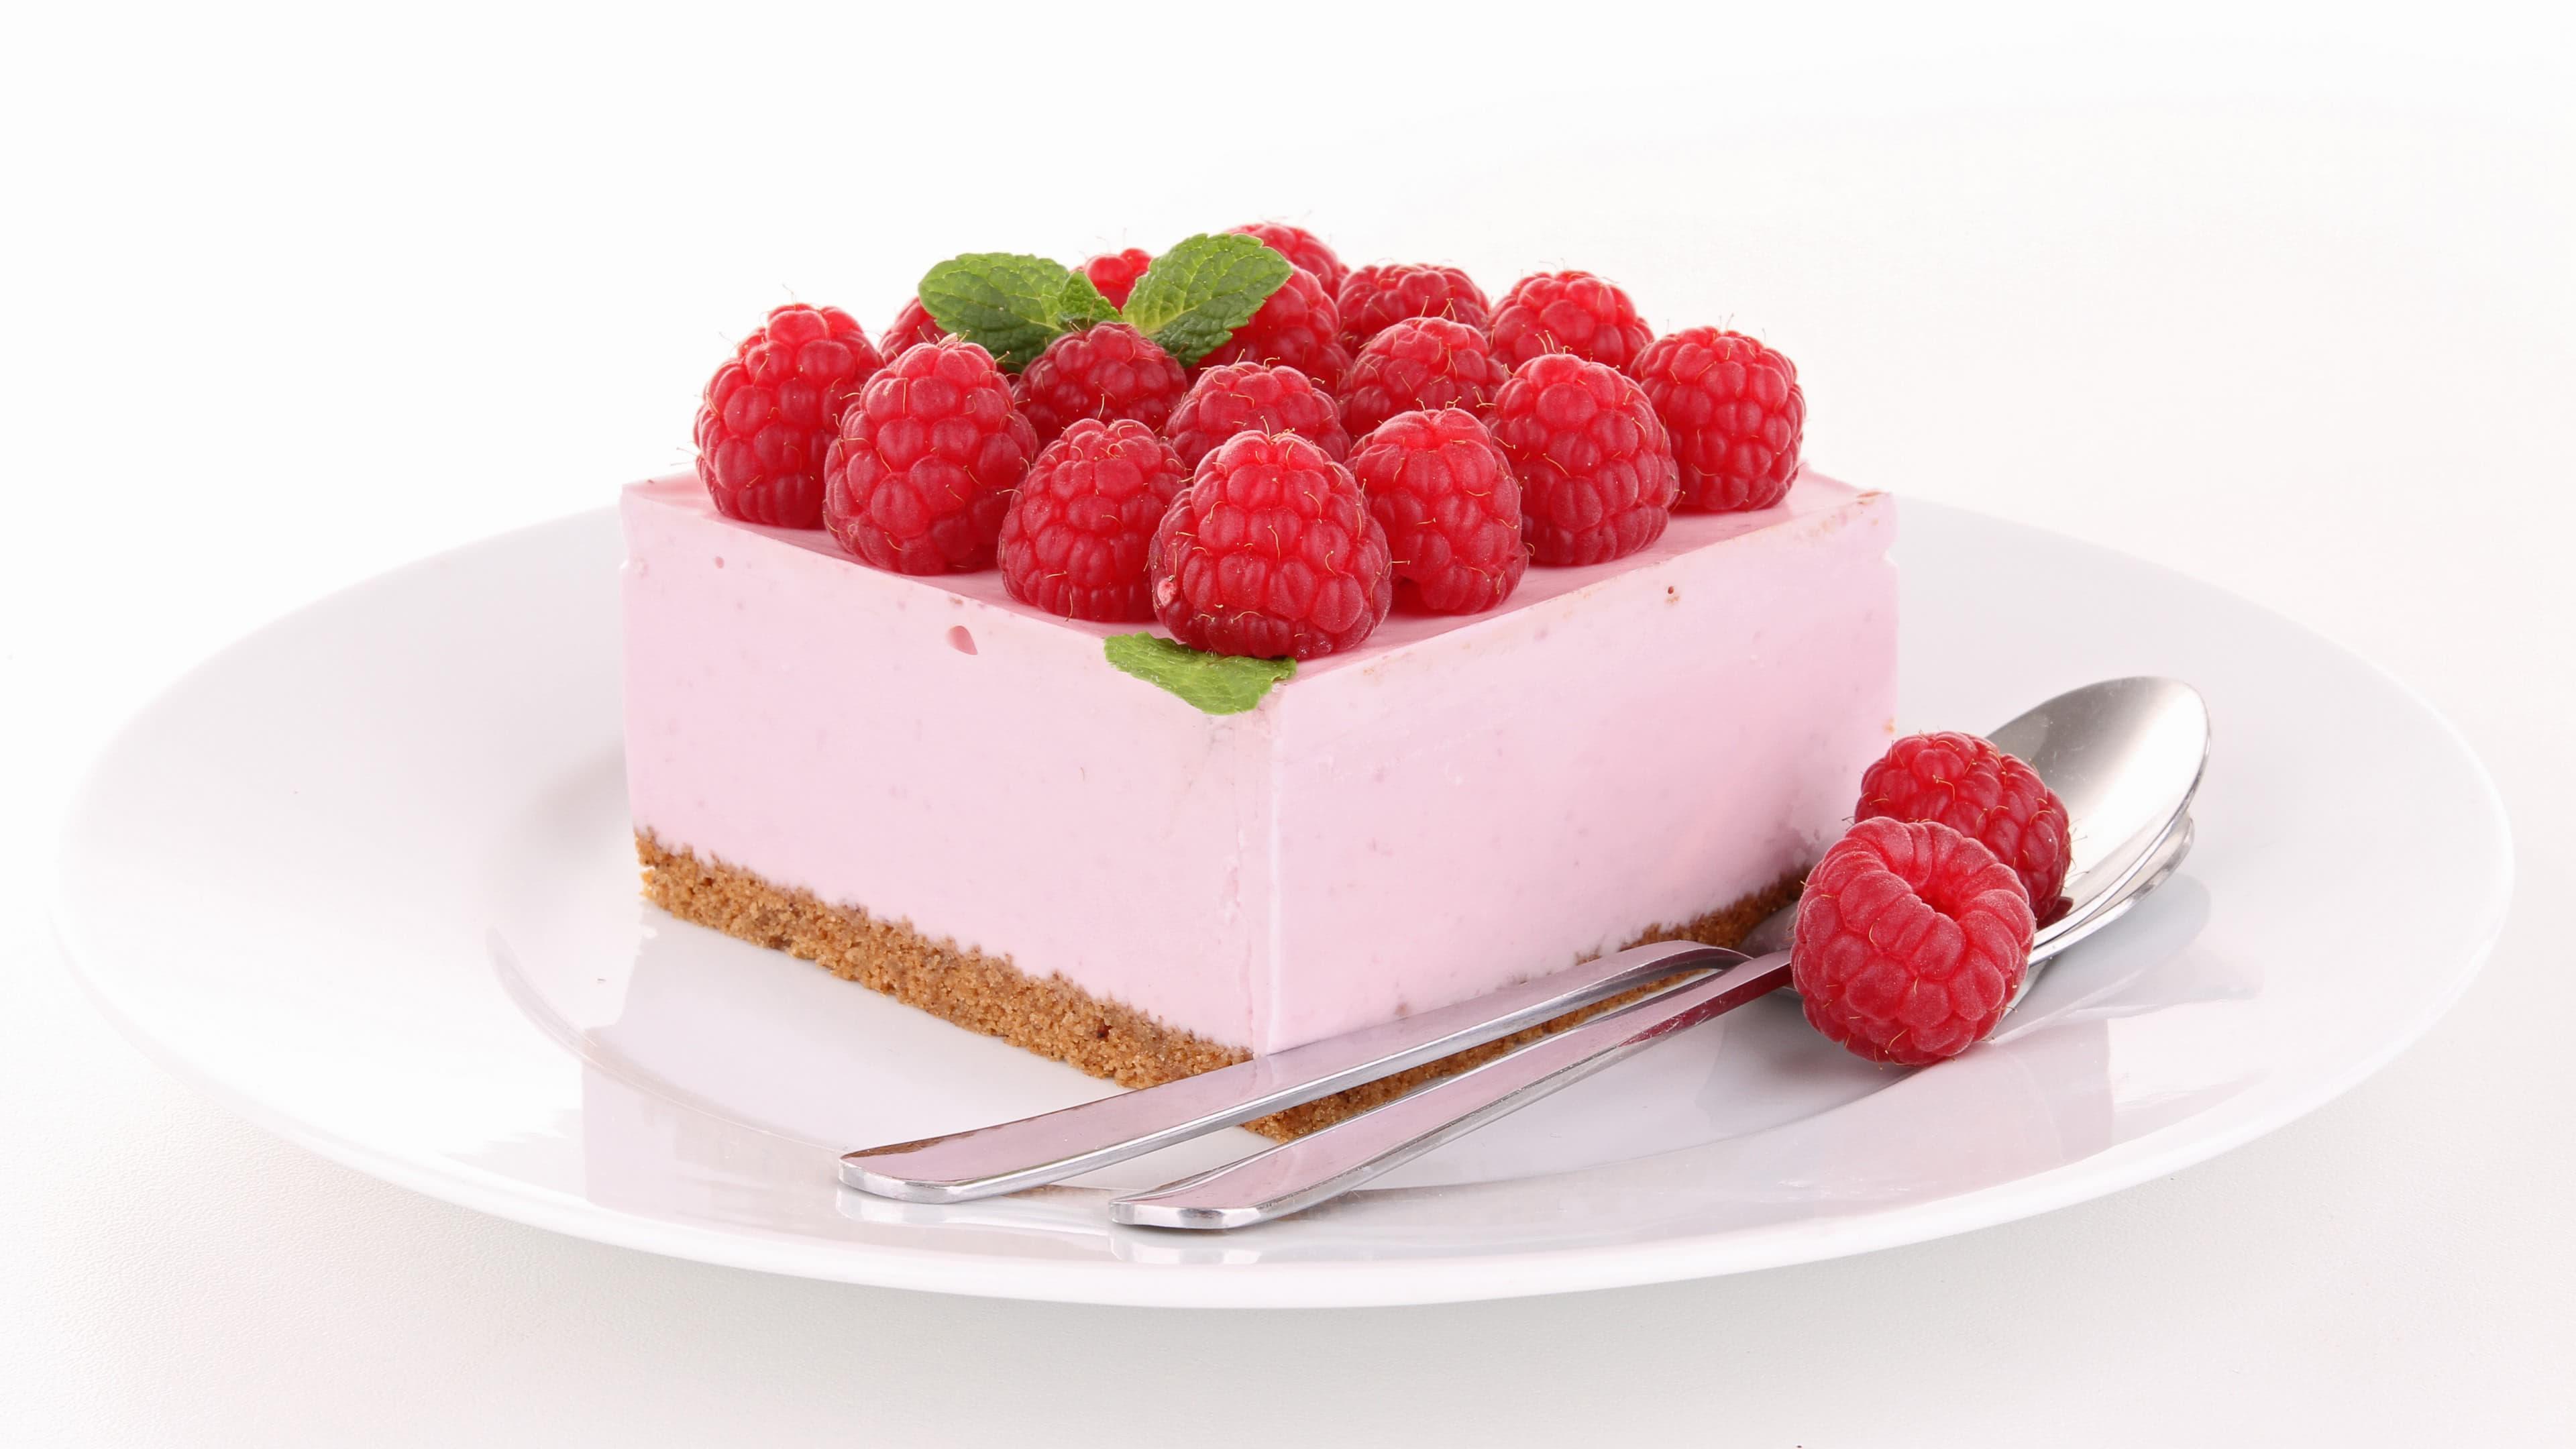 raspberry cheesecake uhd 4k wallpaper